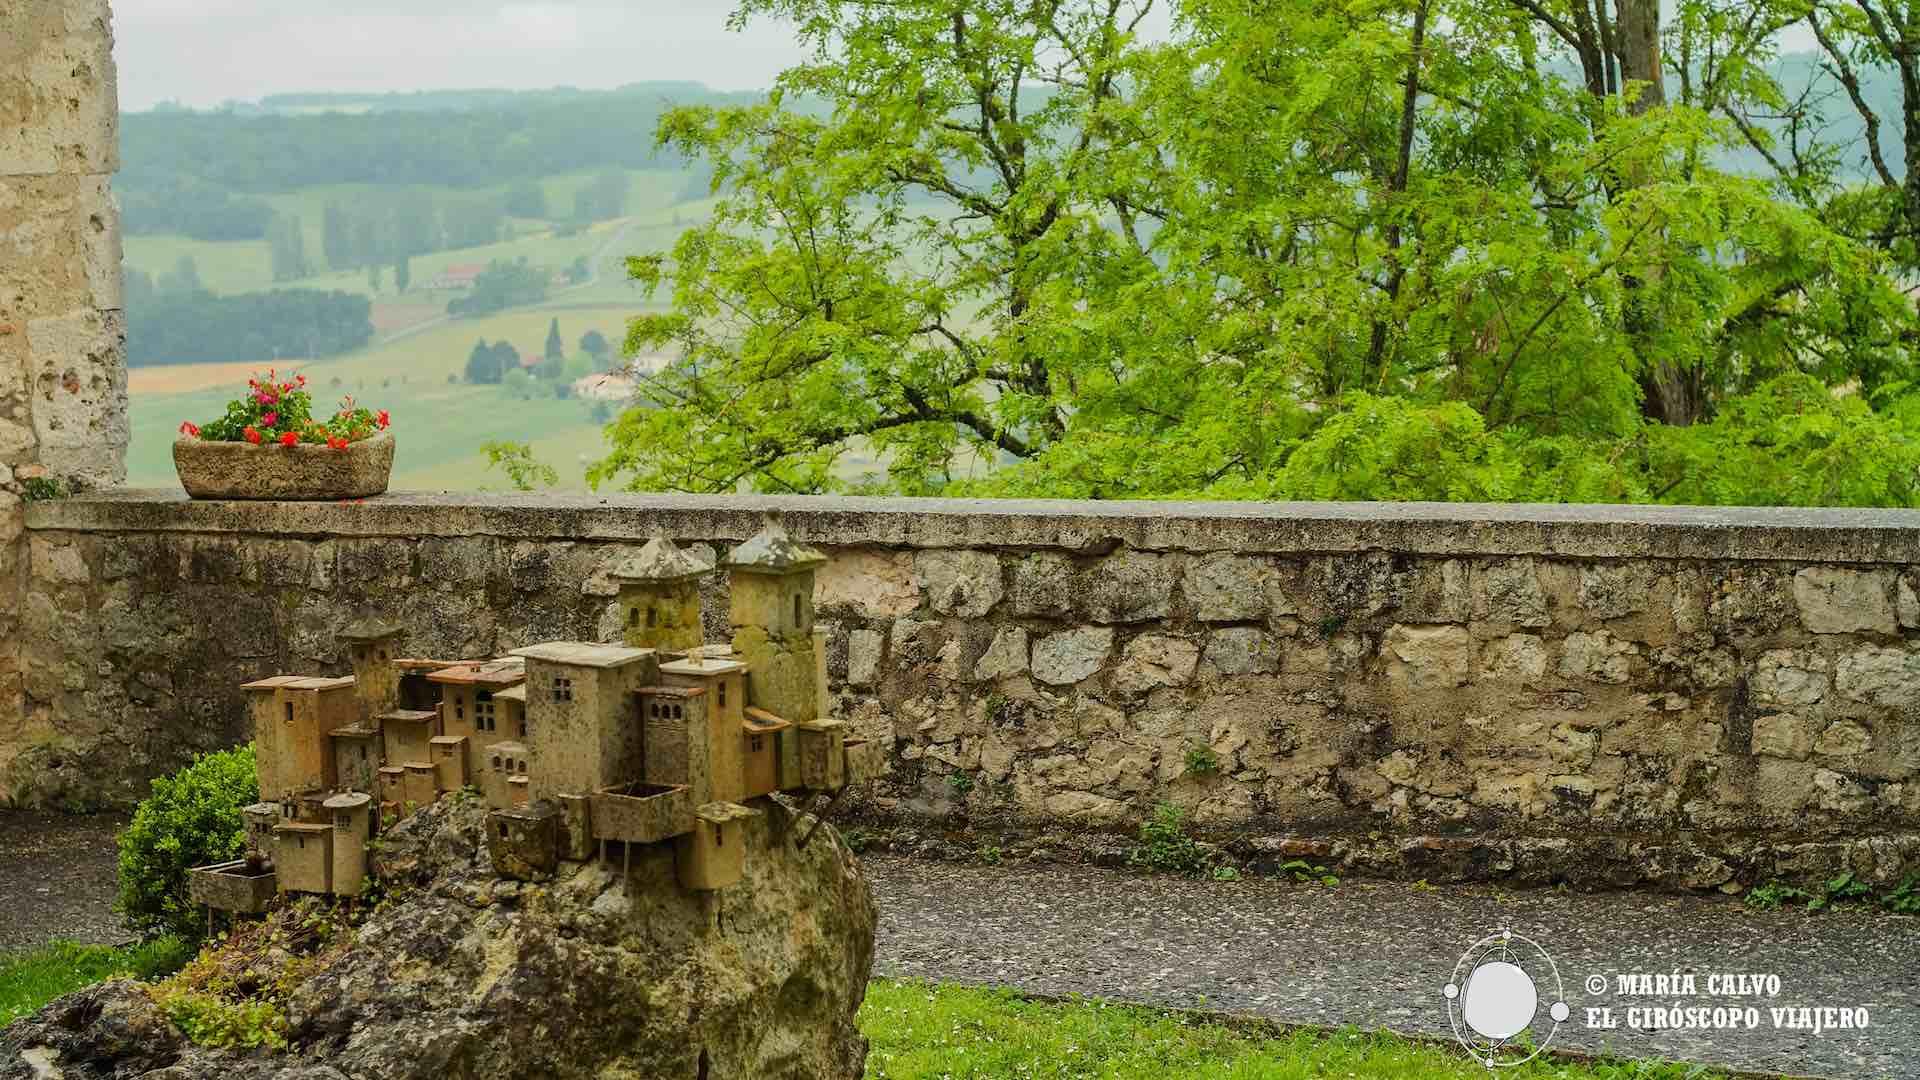 Villa fortificada de Lauzerte, obra de cerámica de Jacques Buchholtz